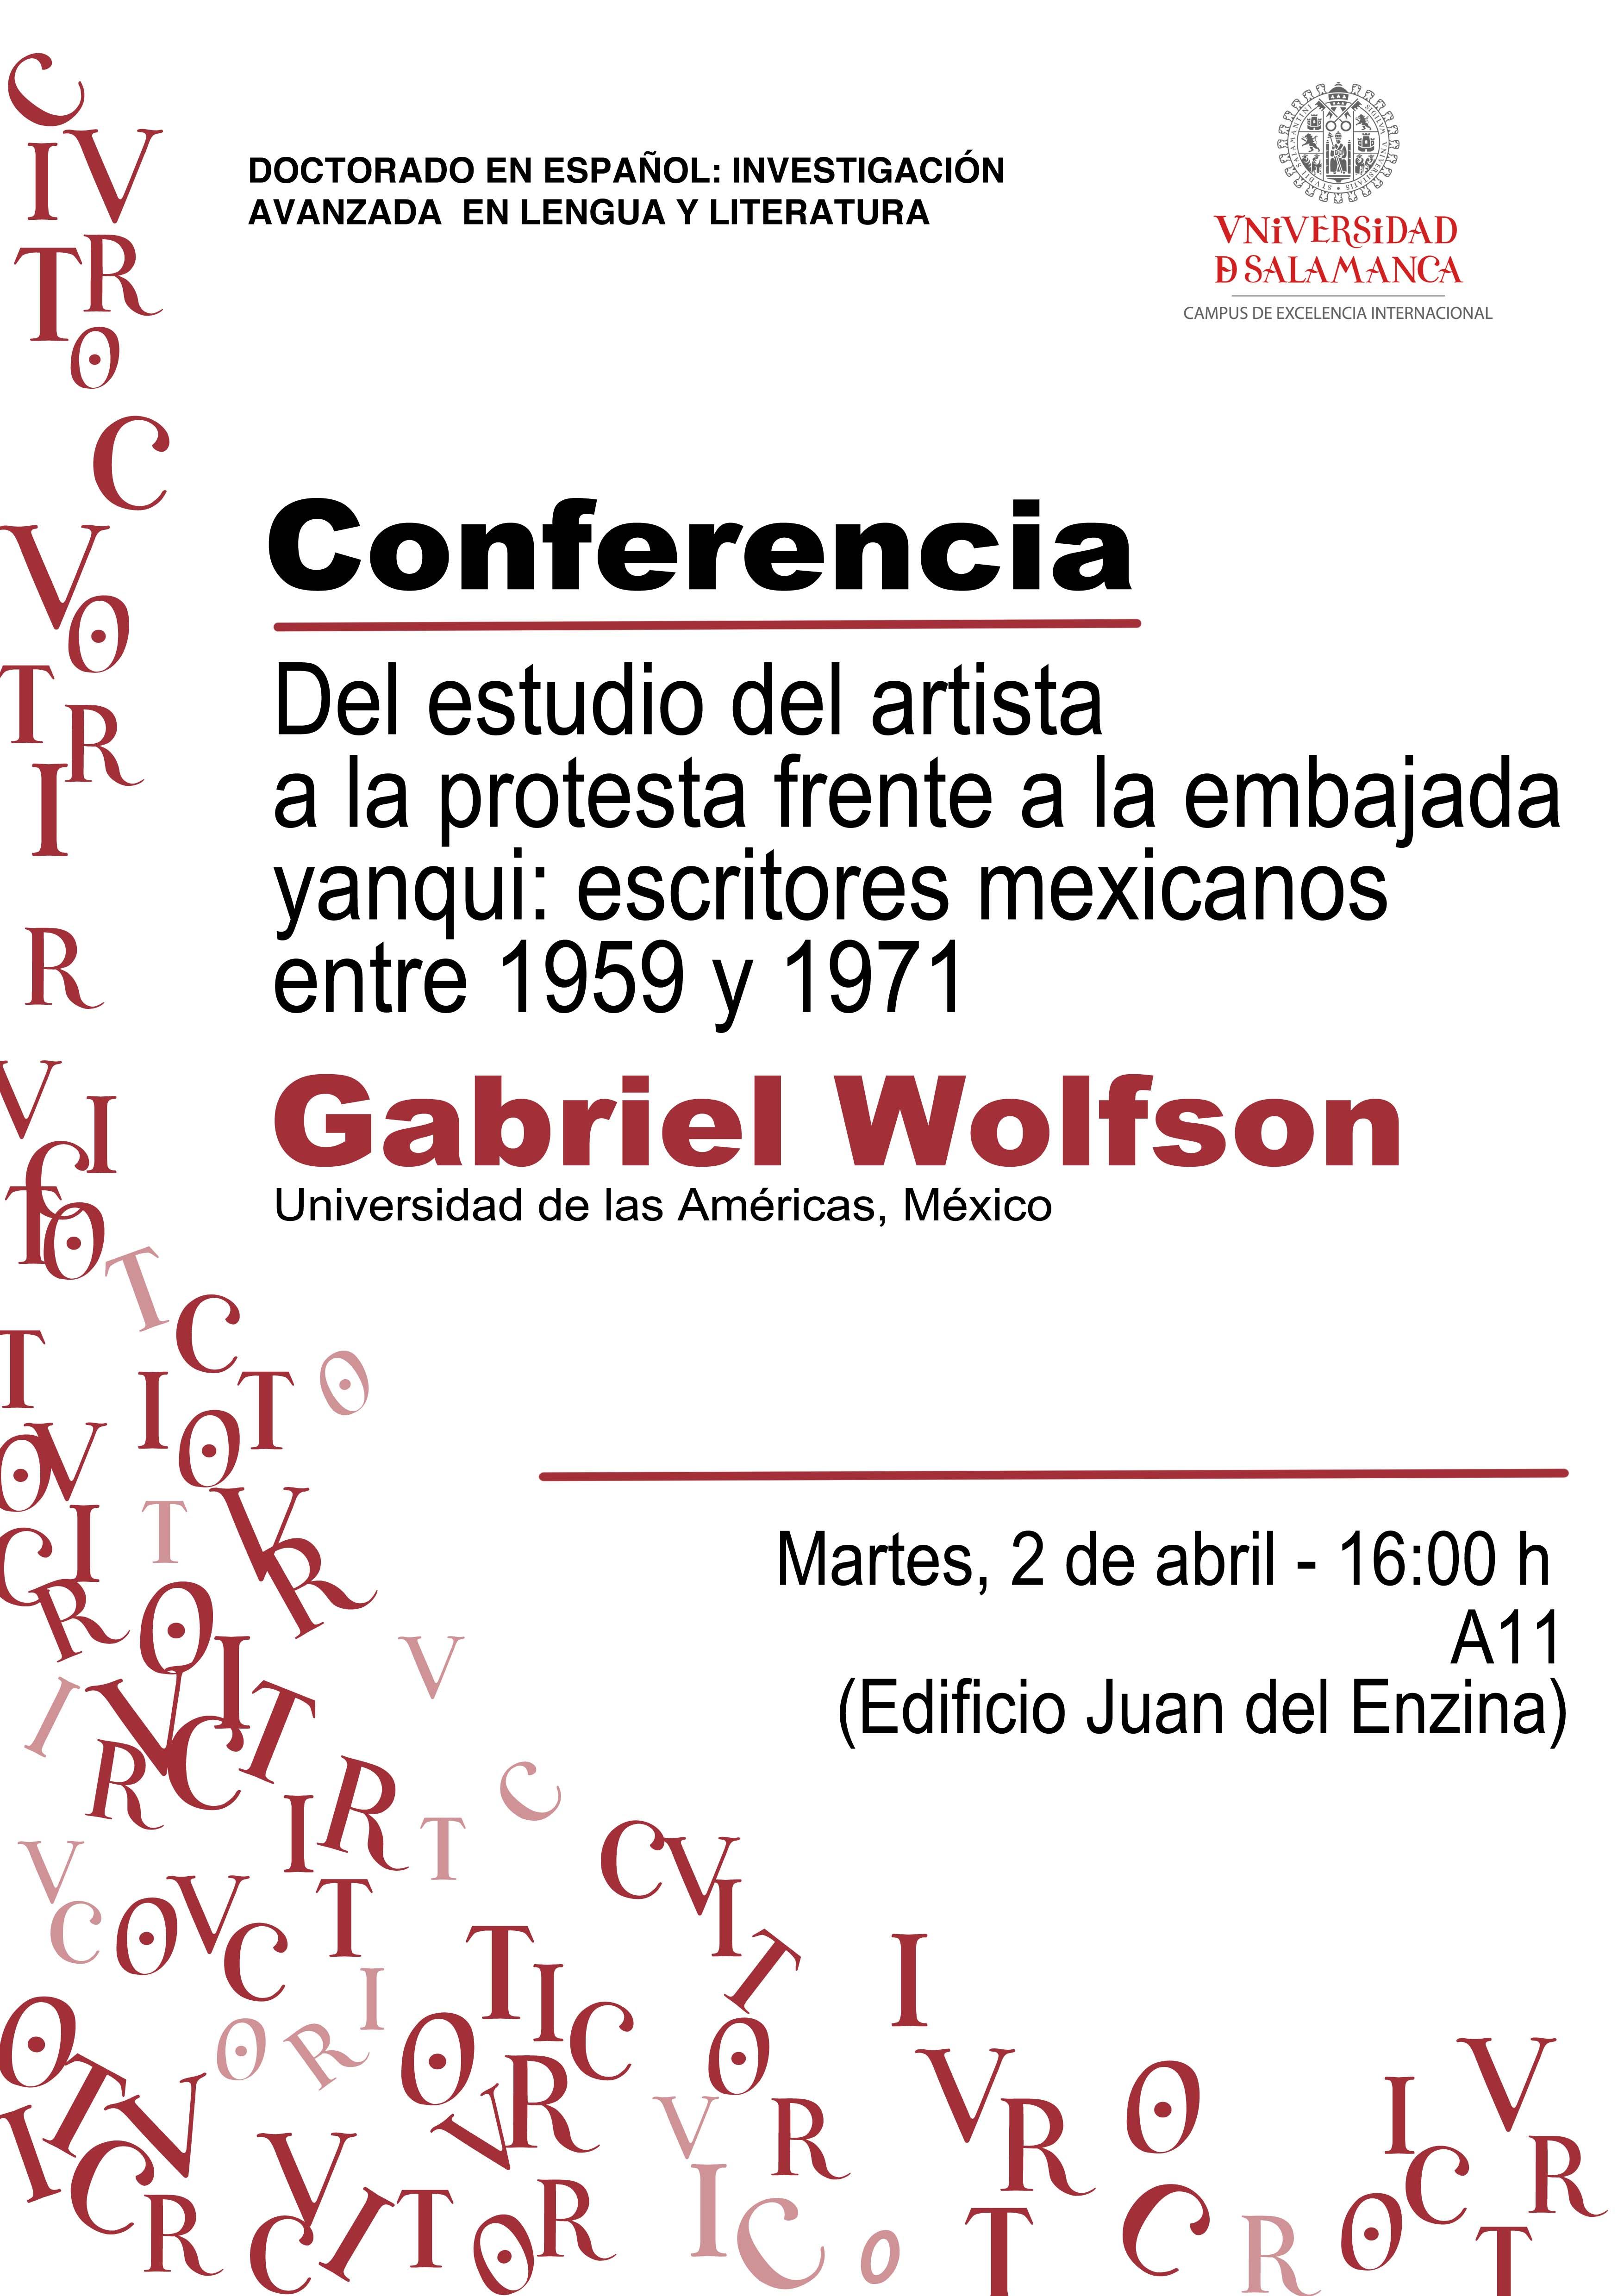 Conferencia de Gabriel Wolfson